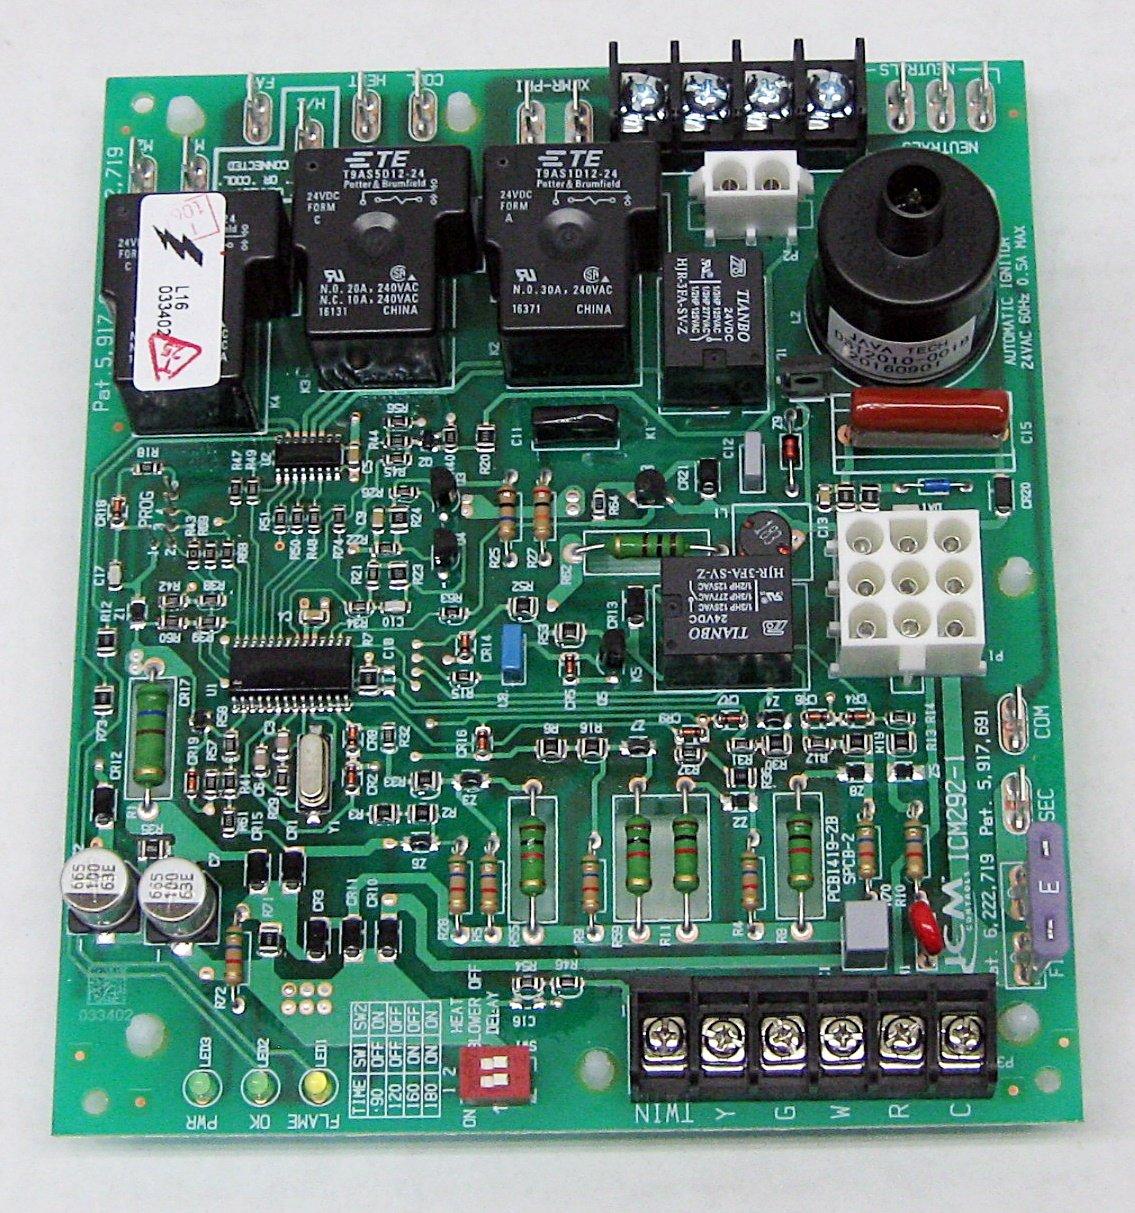 ICM Product 292 by ICM (Image #2)